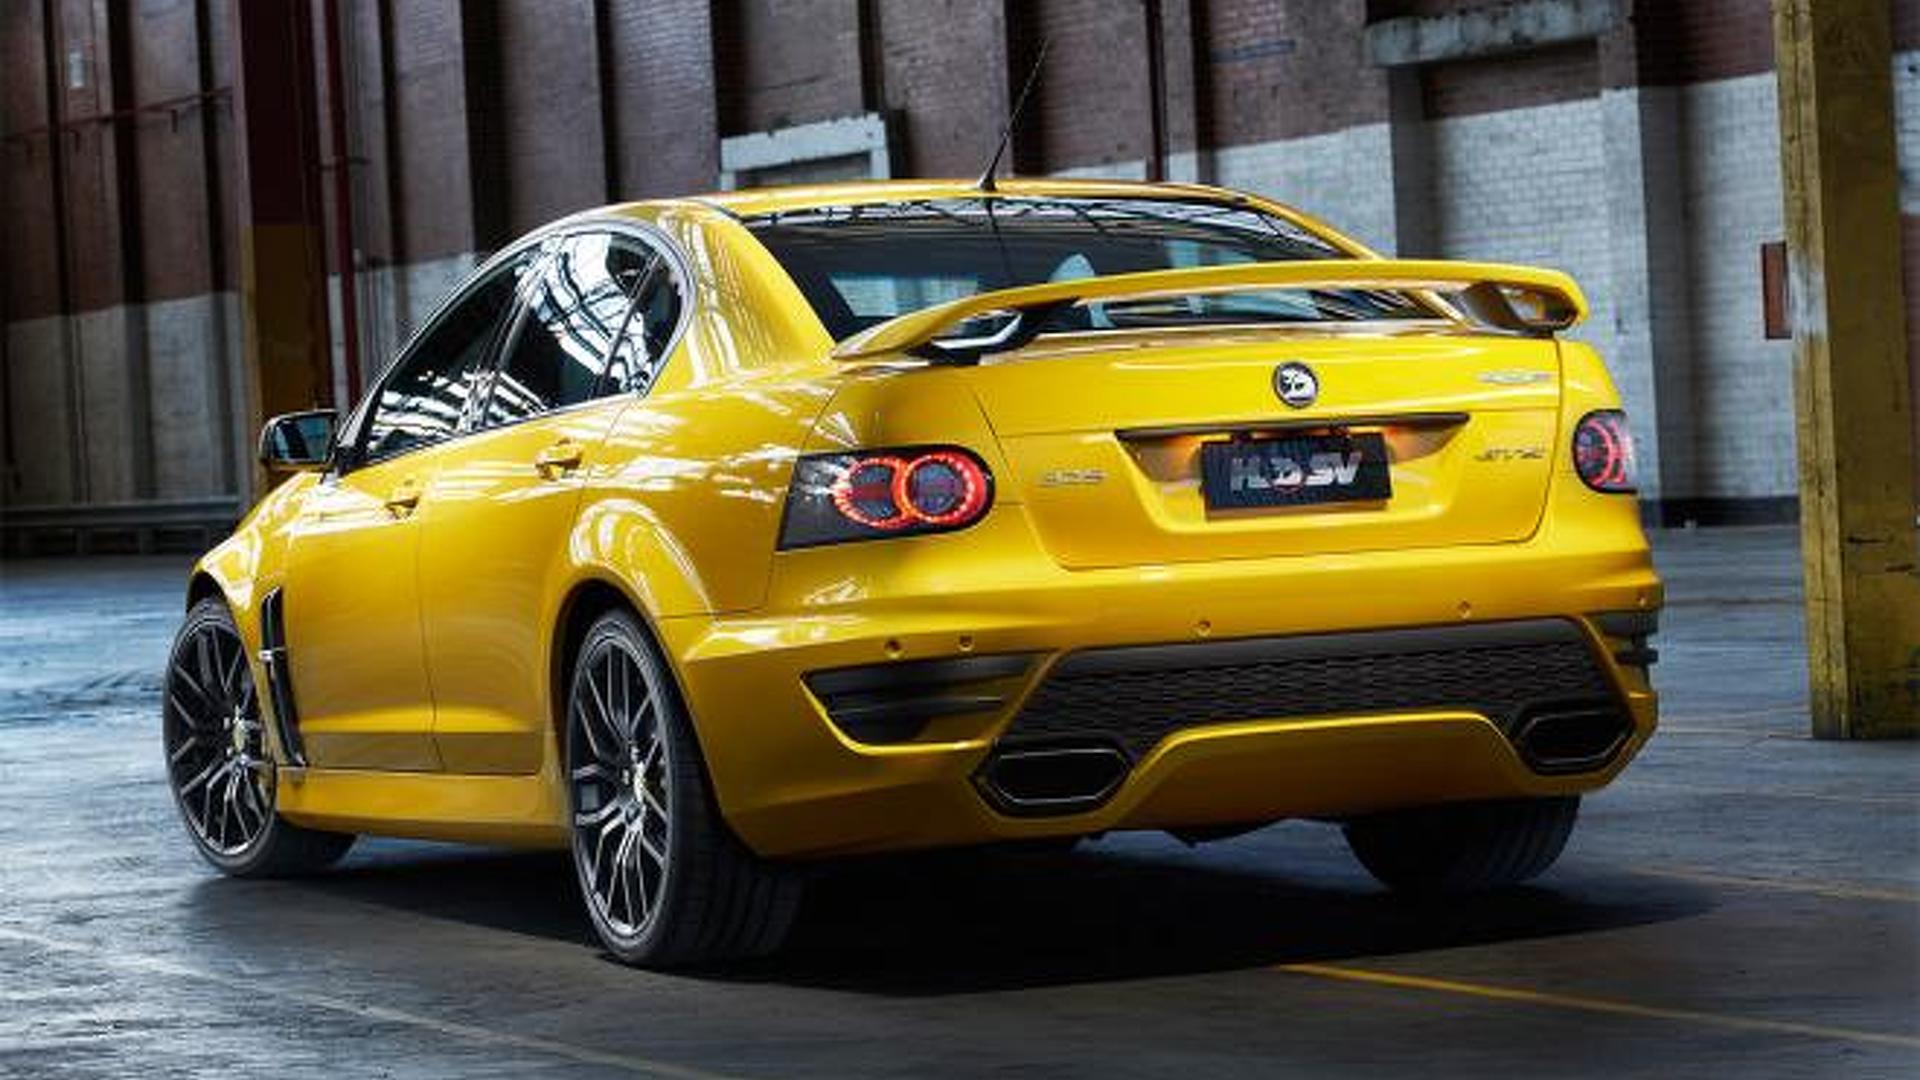 HSV GTS 25th Anniversary Edition announced